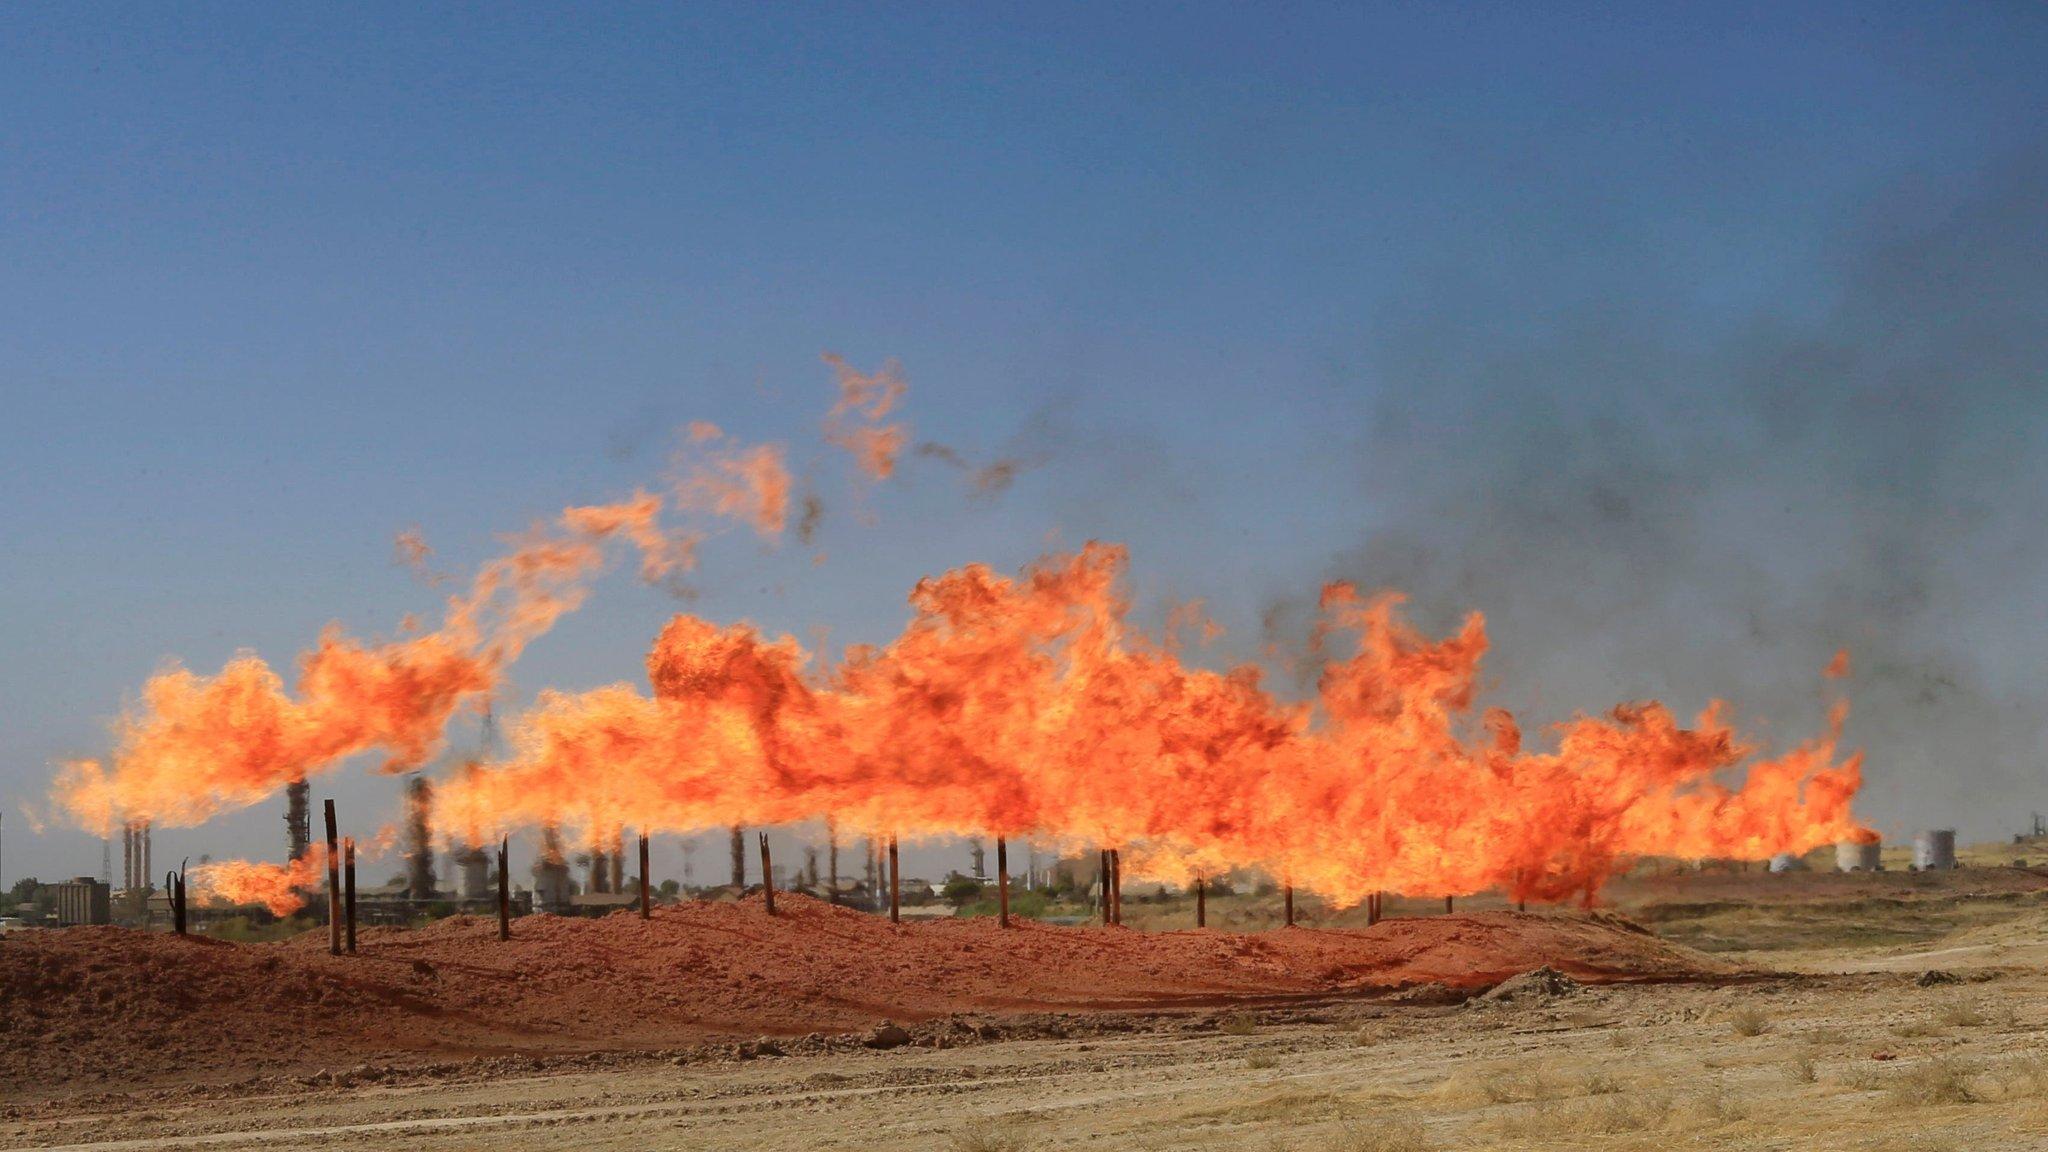 Oil flows again from Iraq's Kirkuk thanks to US intervention Cdd49e64-e7ba-11e8-8827-ff56e7163c11